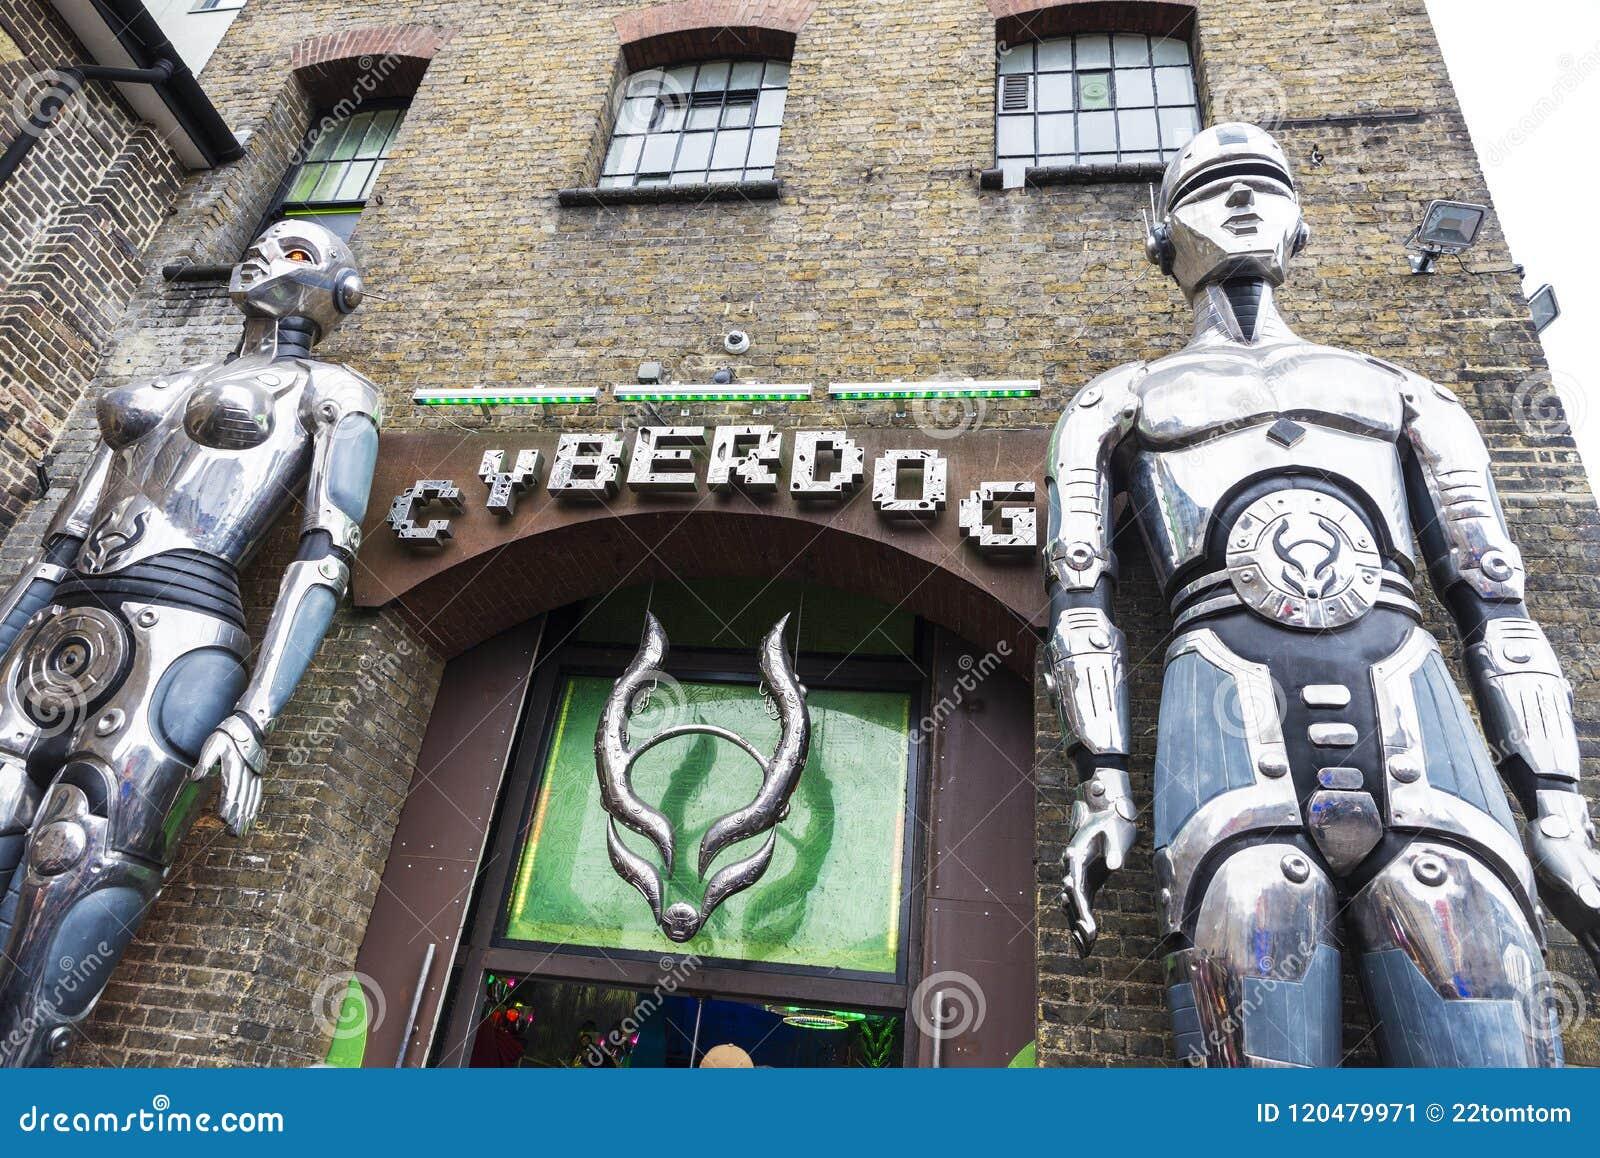 c23fd0fdc7 Shop Called Cyberdog In Camden Market In London